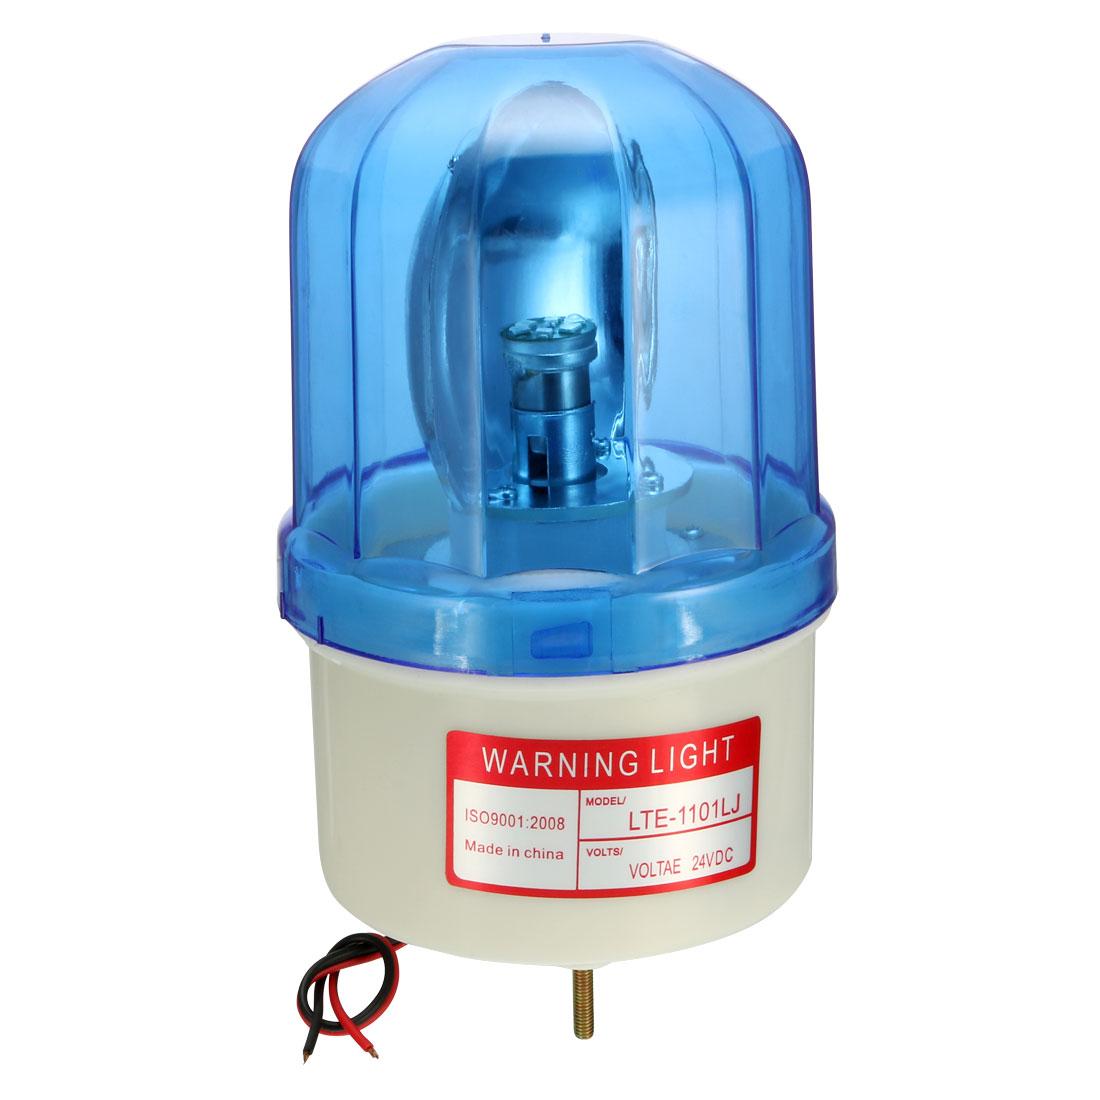 LED Warning Light Bulb Rotating Flashing Lamp Buzzer 90dB DC 24V Blue LTE1101LJ